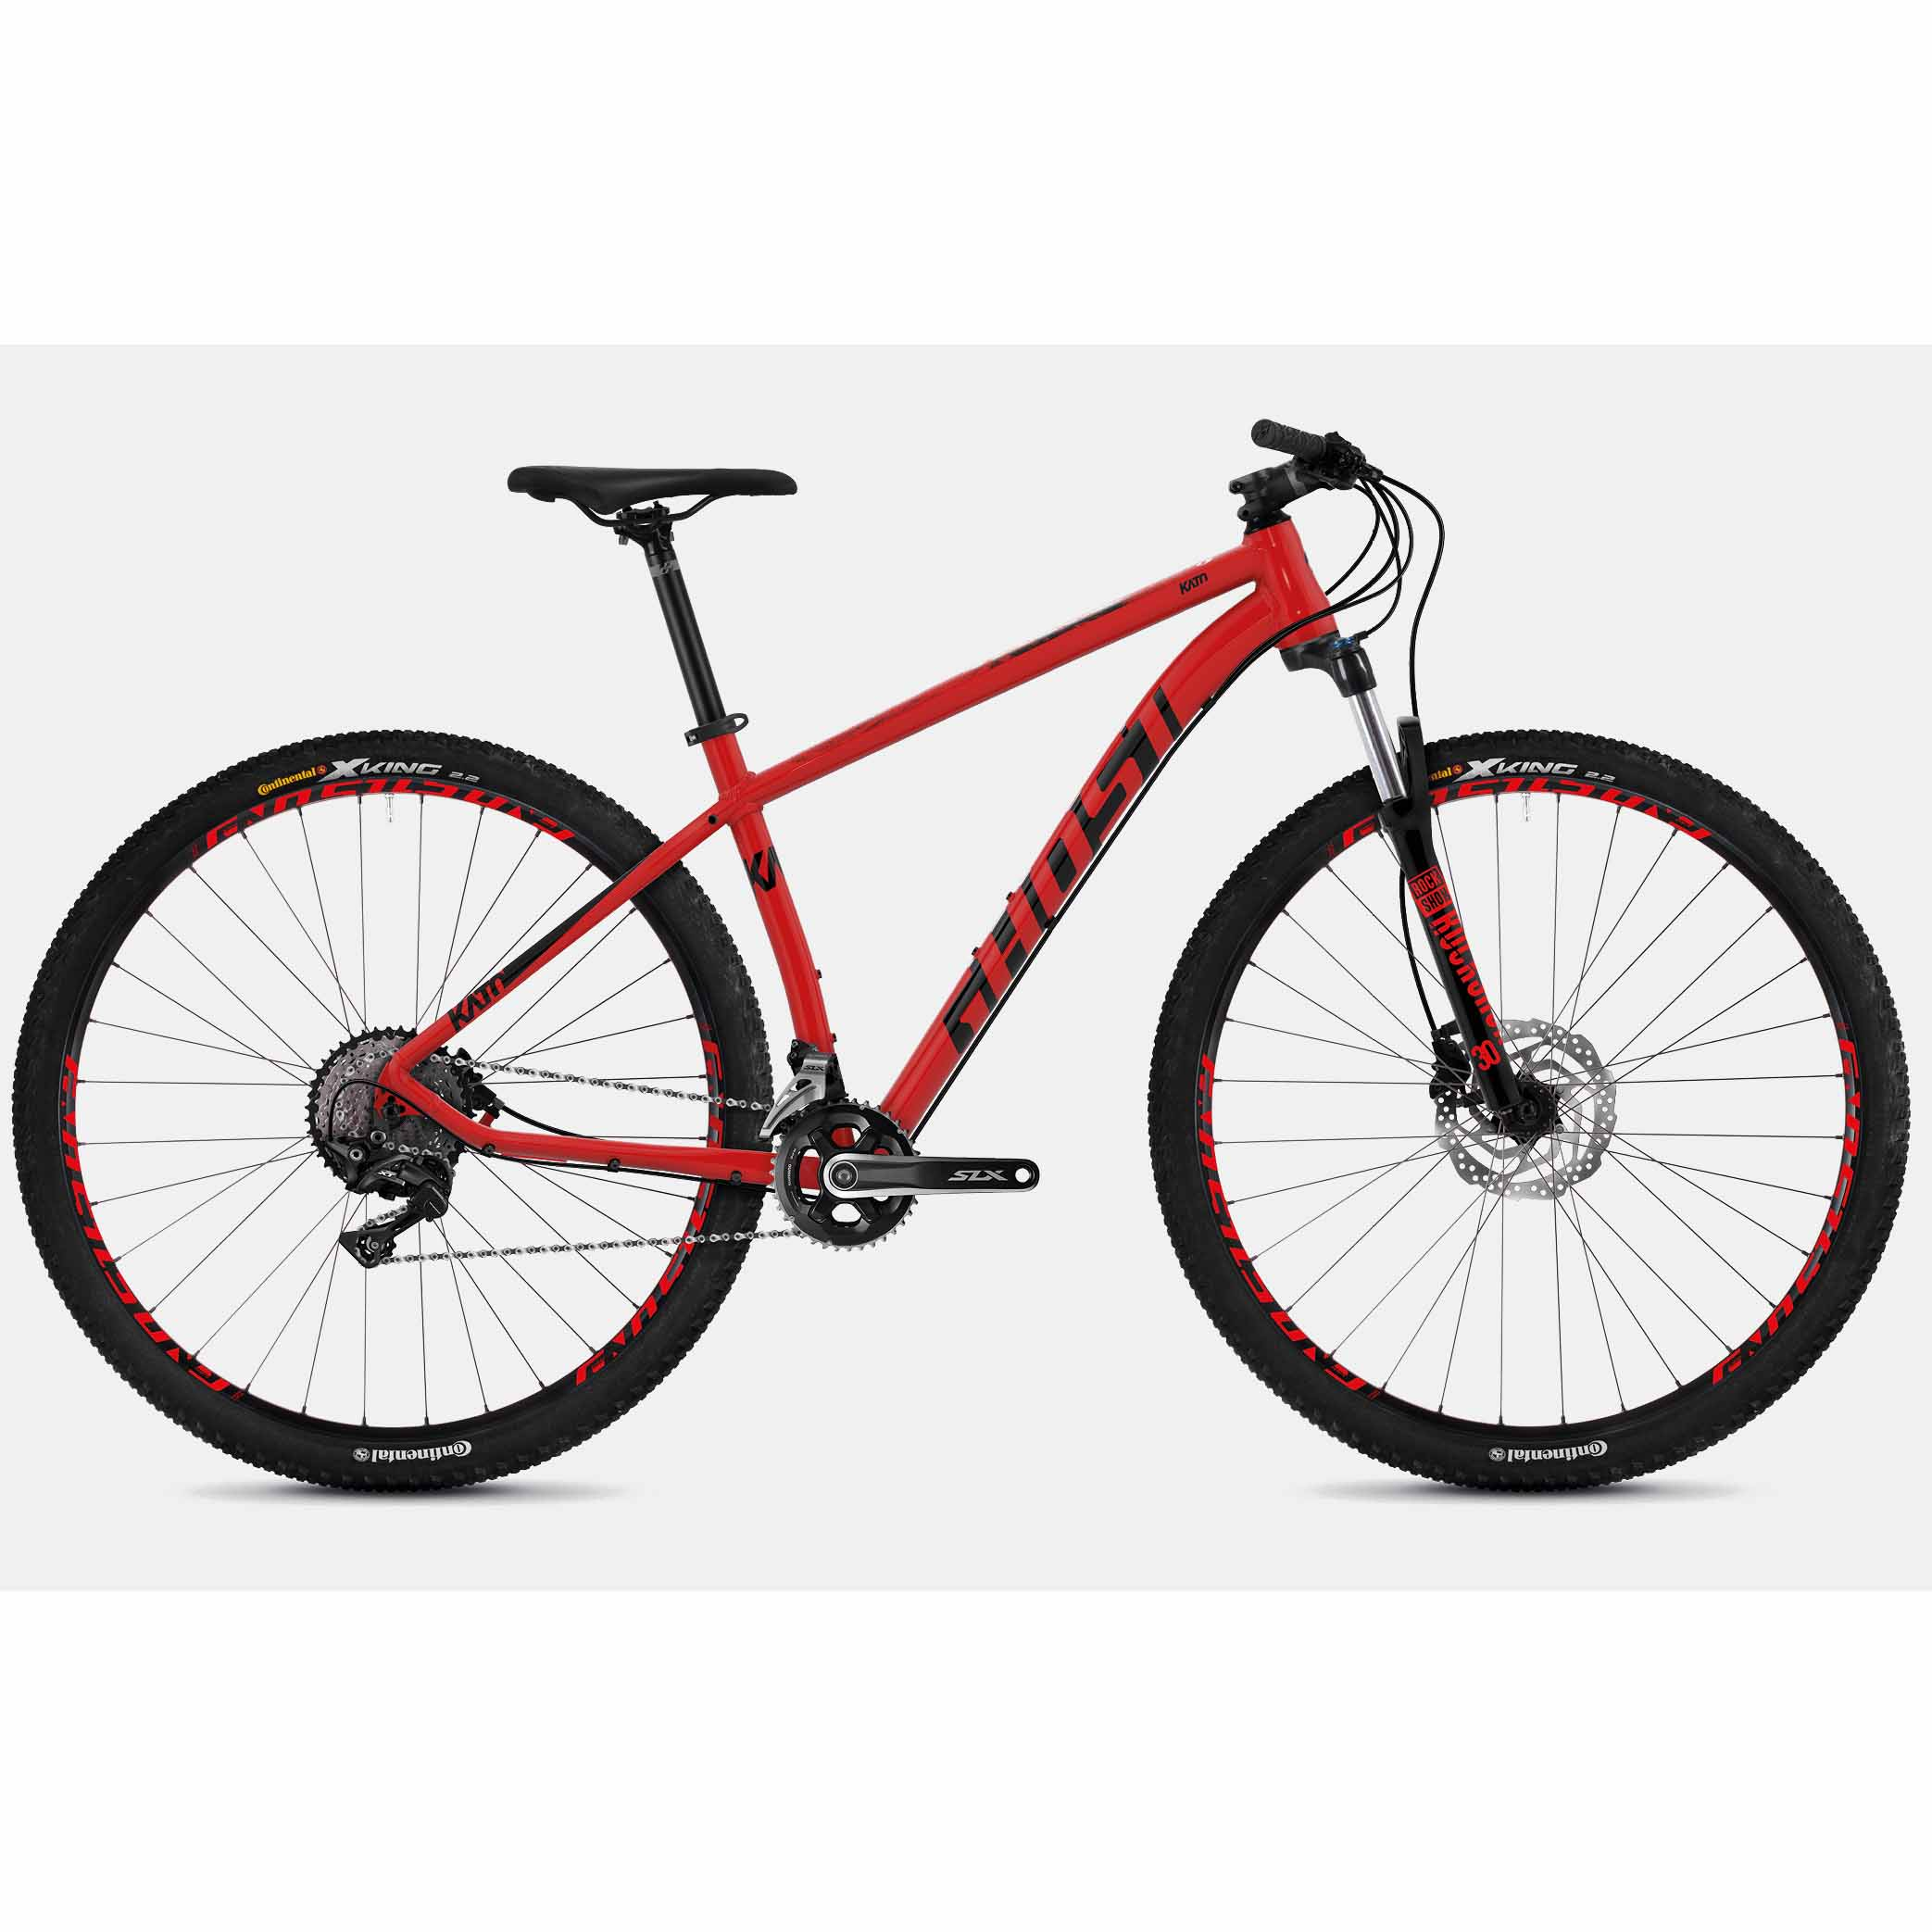 Фото Велосипед Ghost Kato 7.9 29″, рама L, красно-черный, 2019